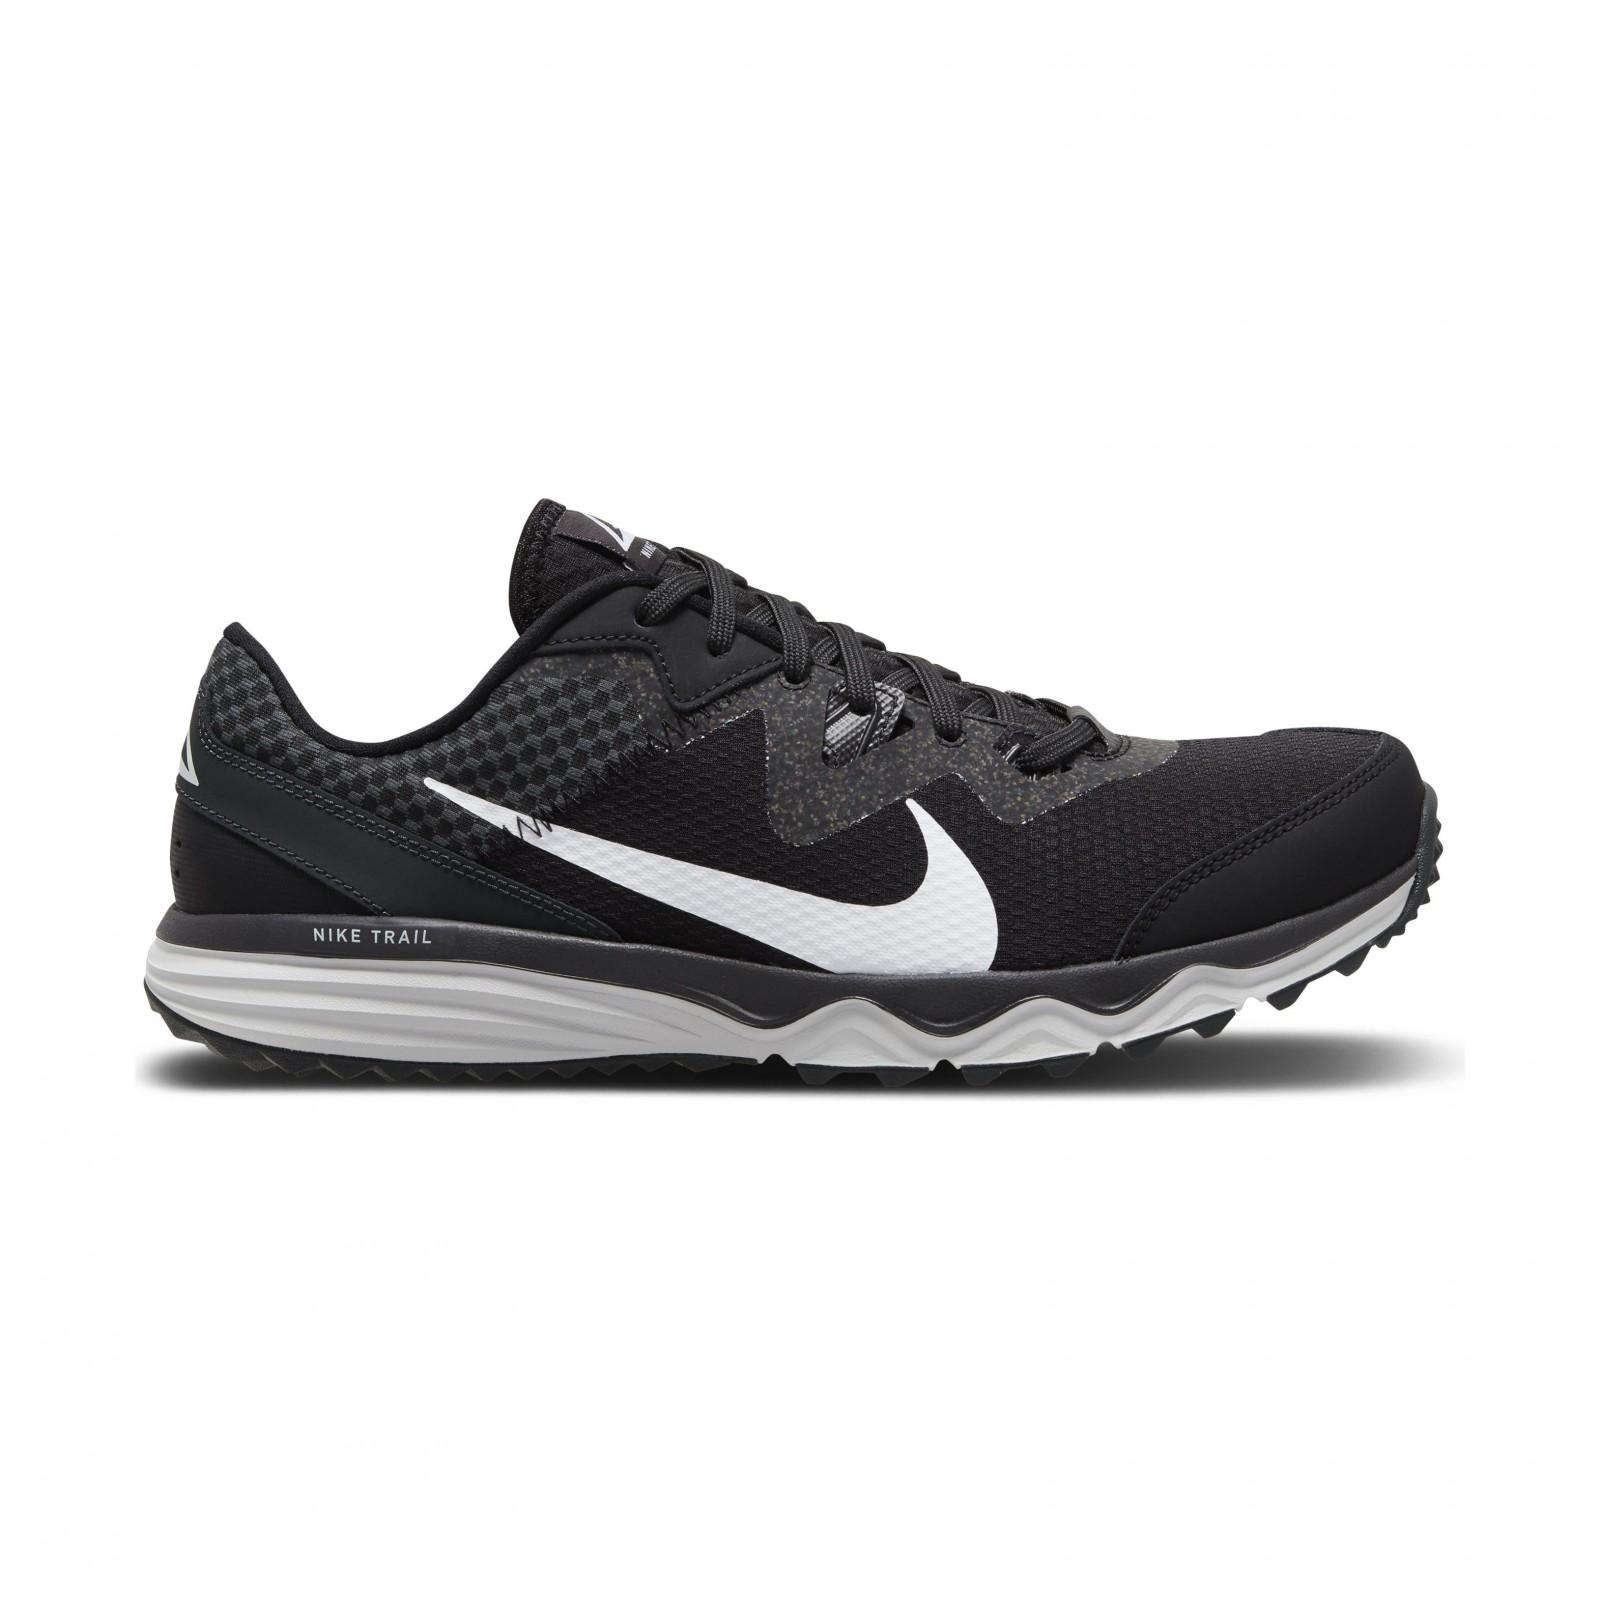 Nike Juniper Trail BLACK/WHITE-DK SMOKE GREY-GREY FOG